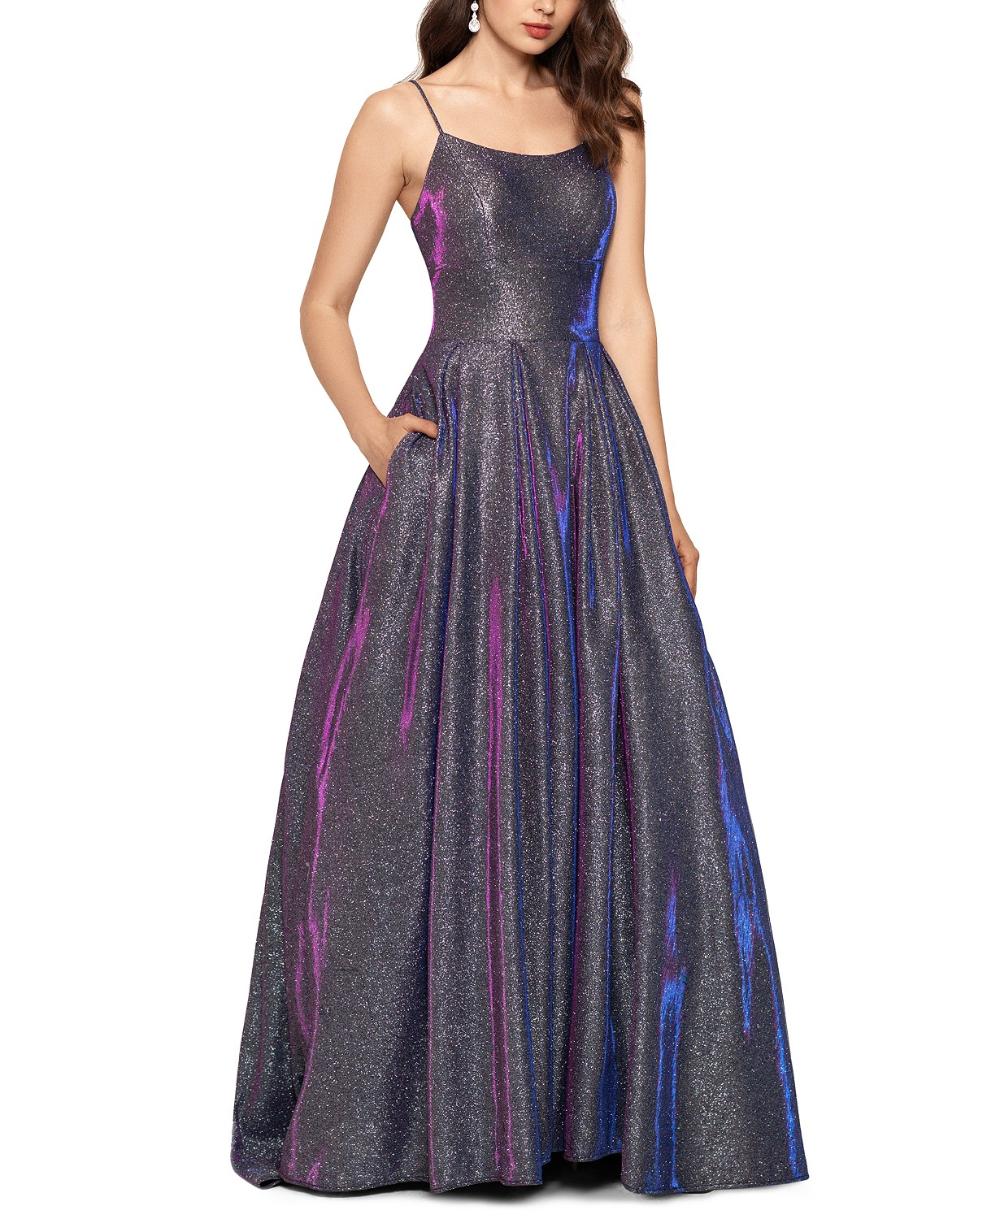 Betsy Adam Galaxy Glitter Ball Gown Reviews Dresses Women Macy S In 2021 Cute Prom Dresses Ball Gowns Galaxy Dress [ 1219 x 1000 Pixel ]